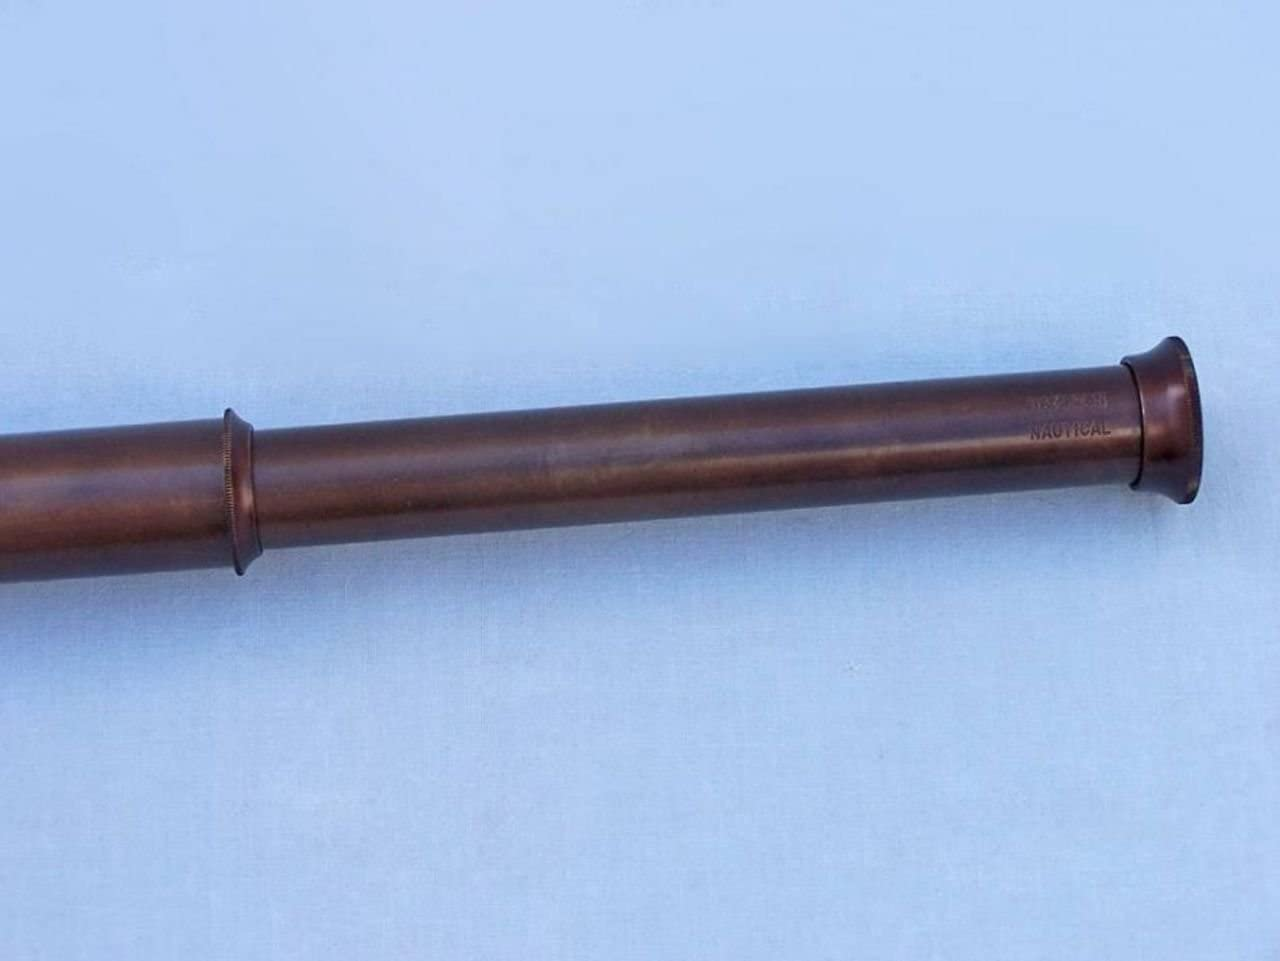 Hampton Nautical  Deluxe Class Hampton Collection Brushed Nickel with Rosewood Box Spyglass Telescope 36